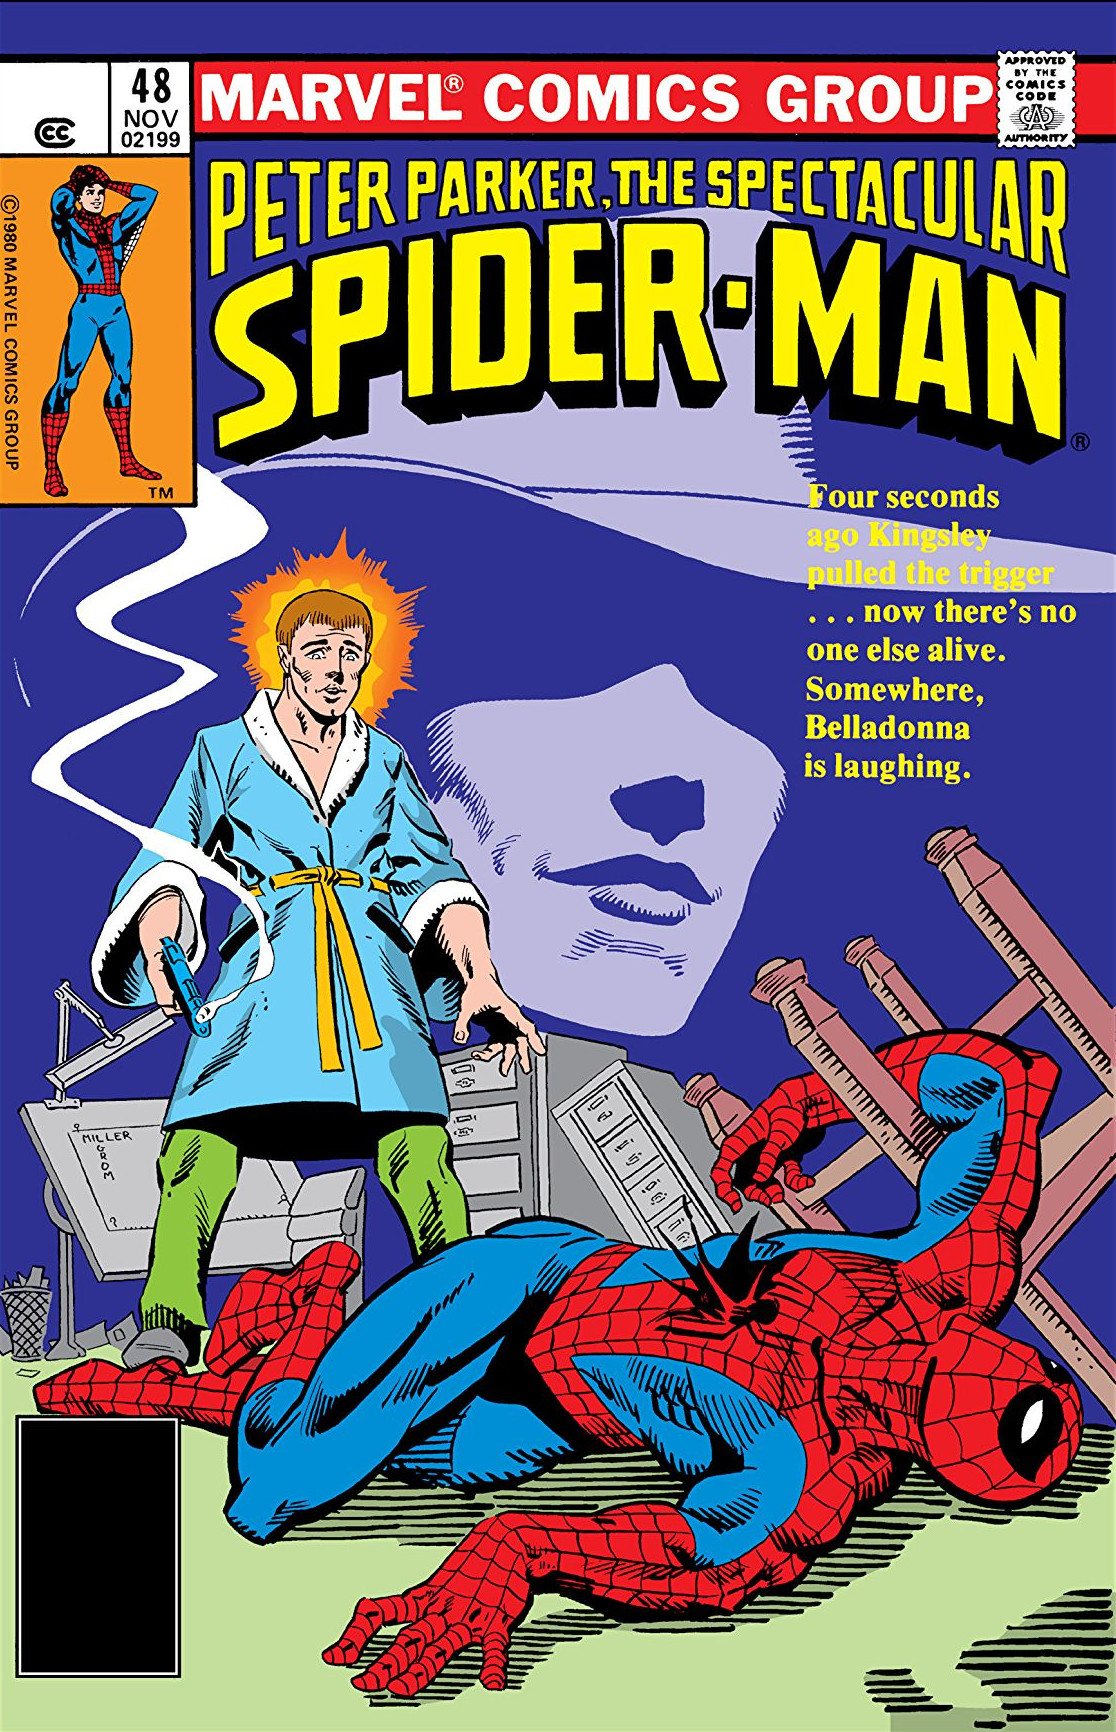 Peter Parker, The Spectacular Spider-Man Vol 1 48